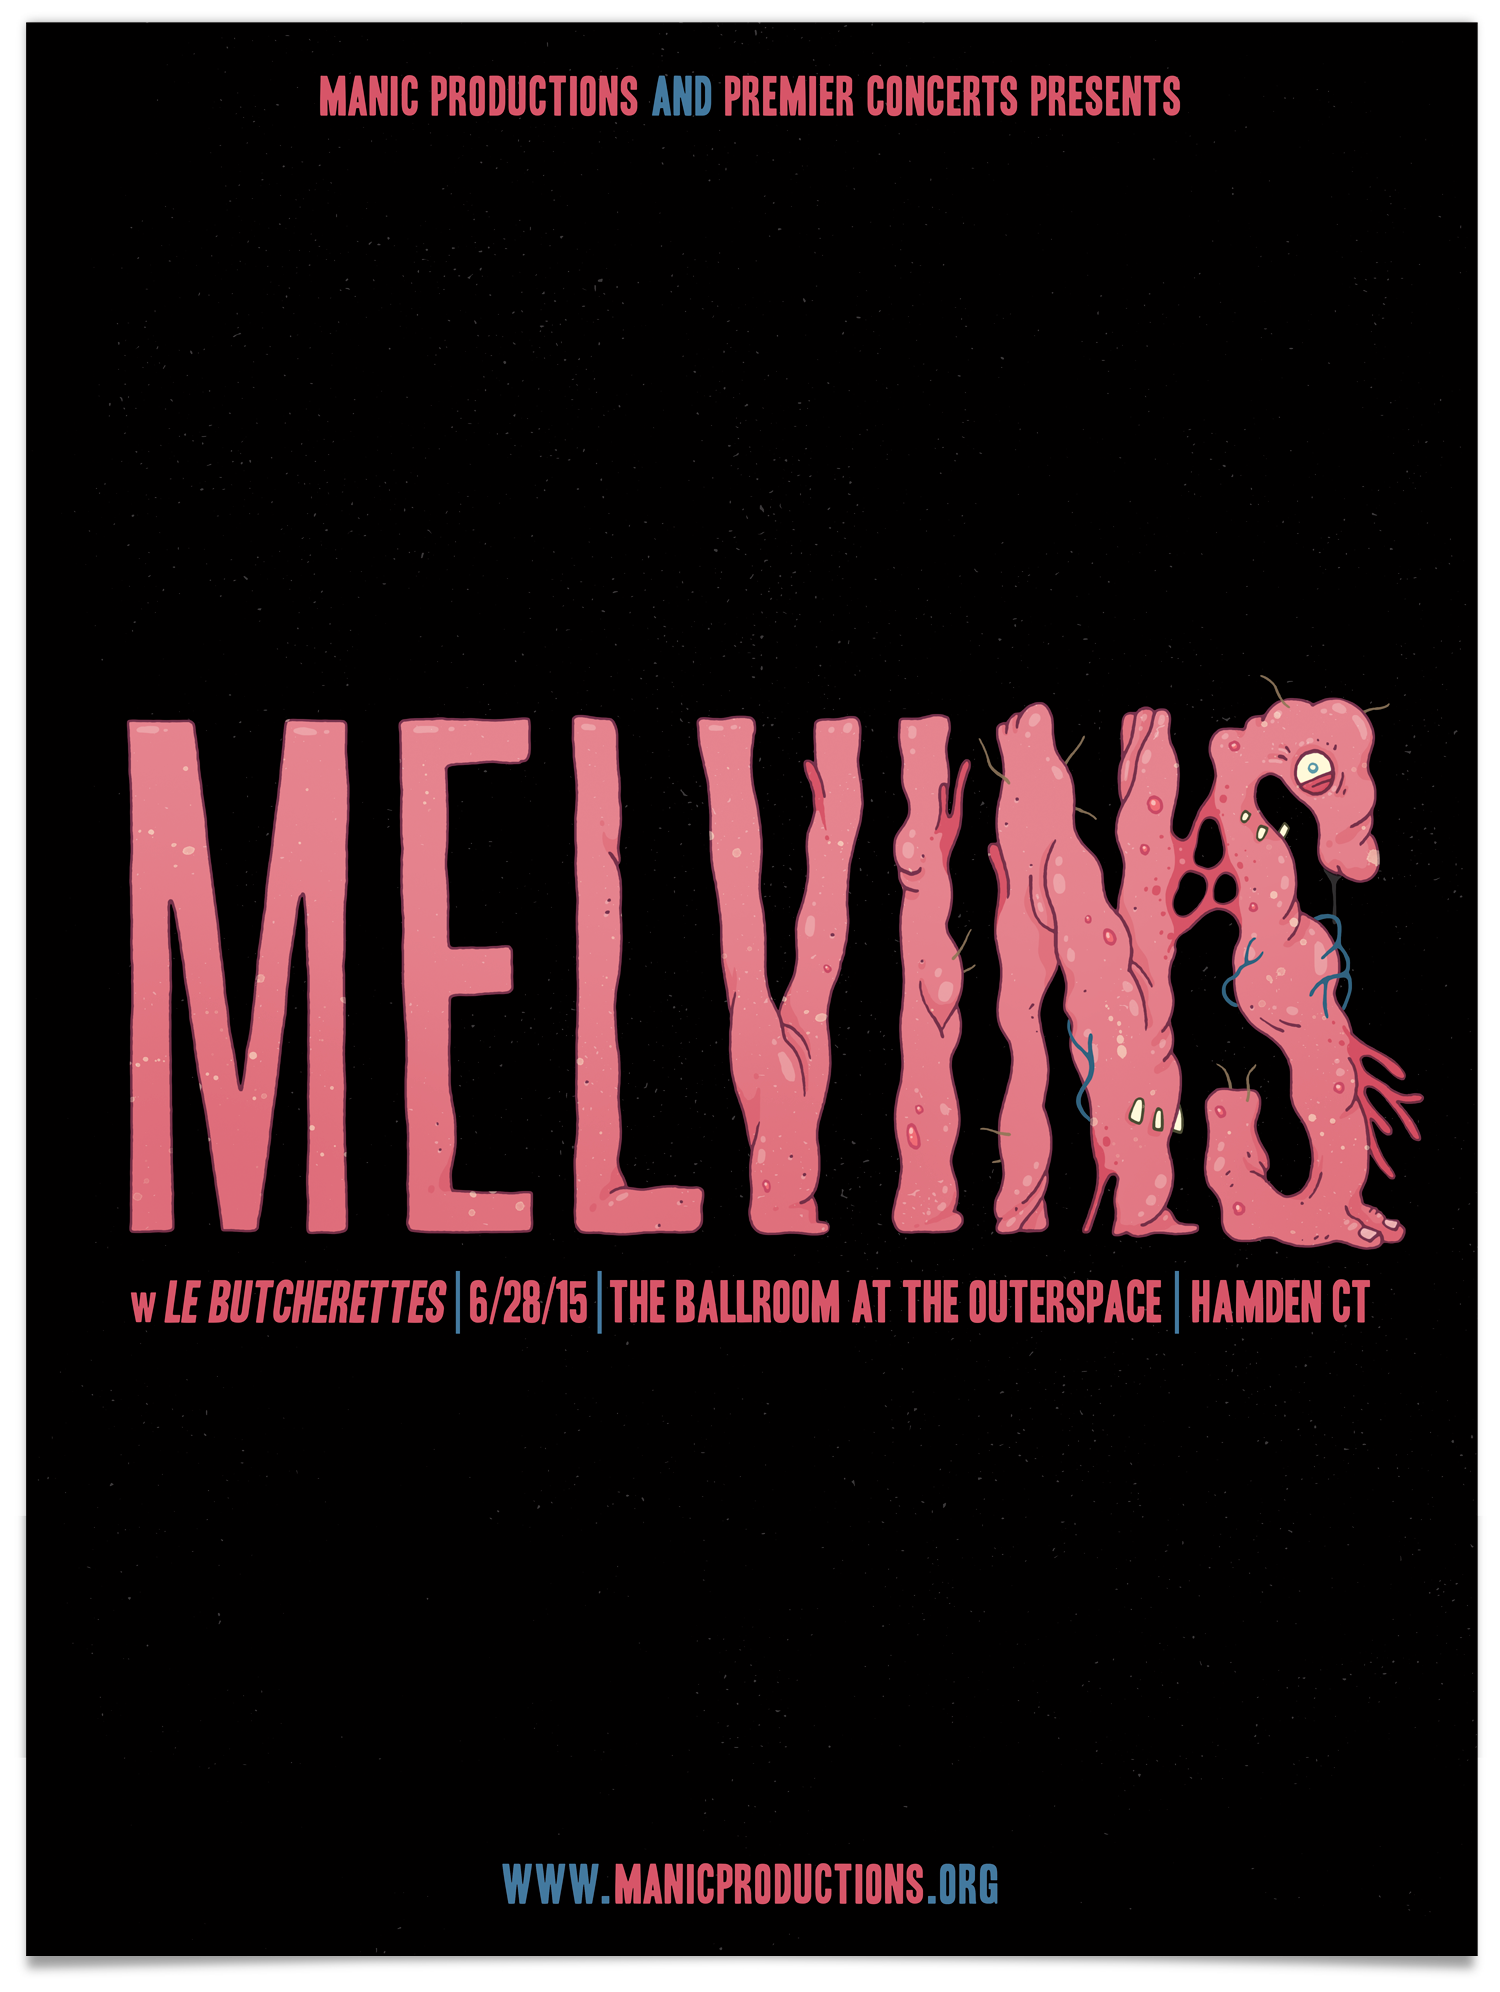 Melvins_poster1.png